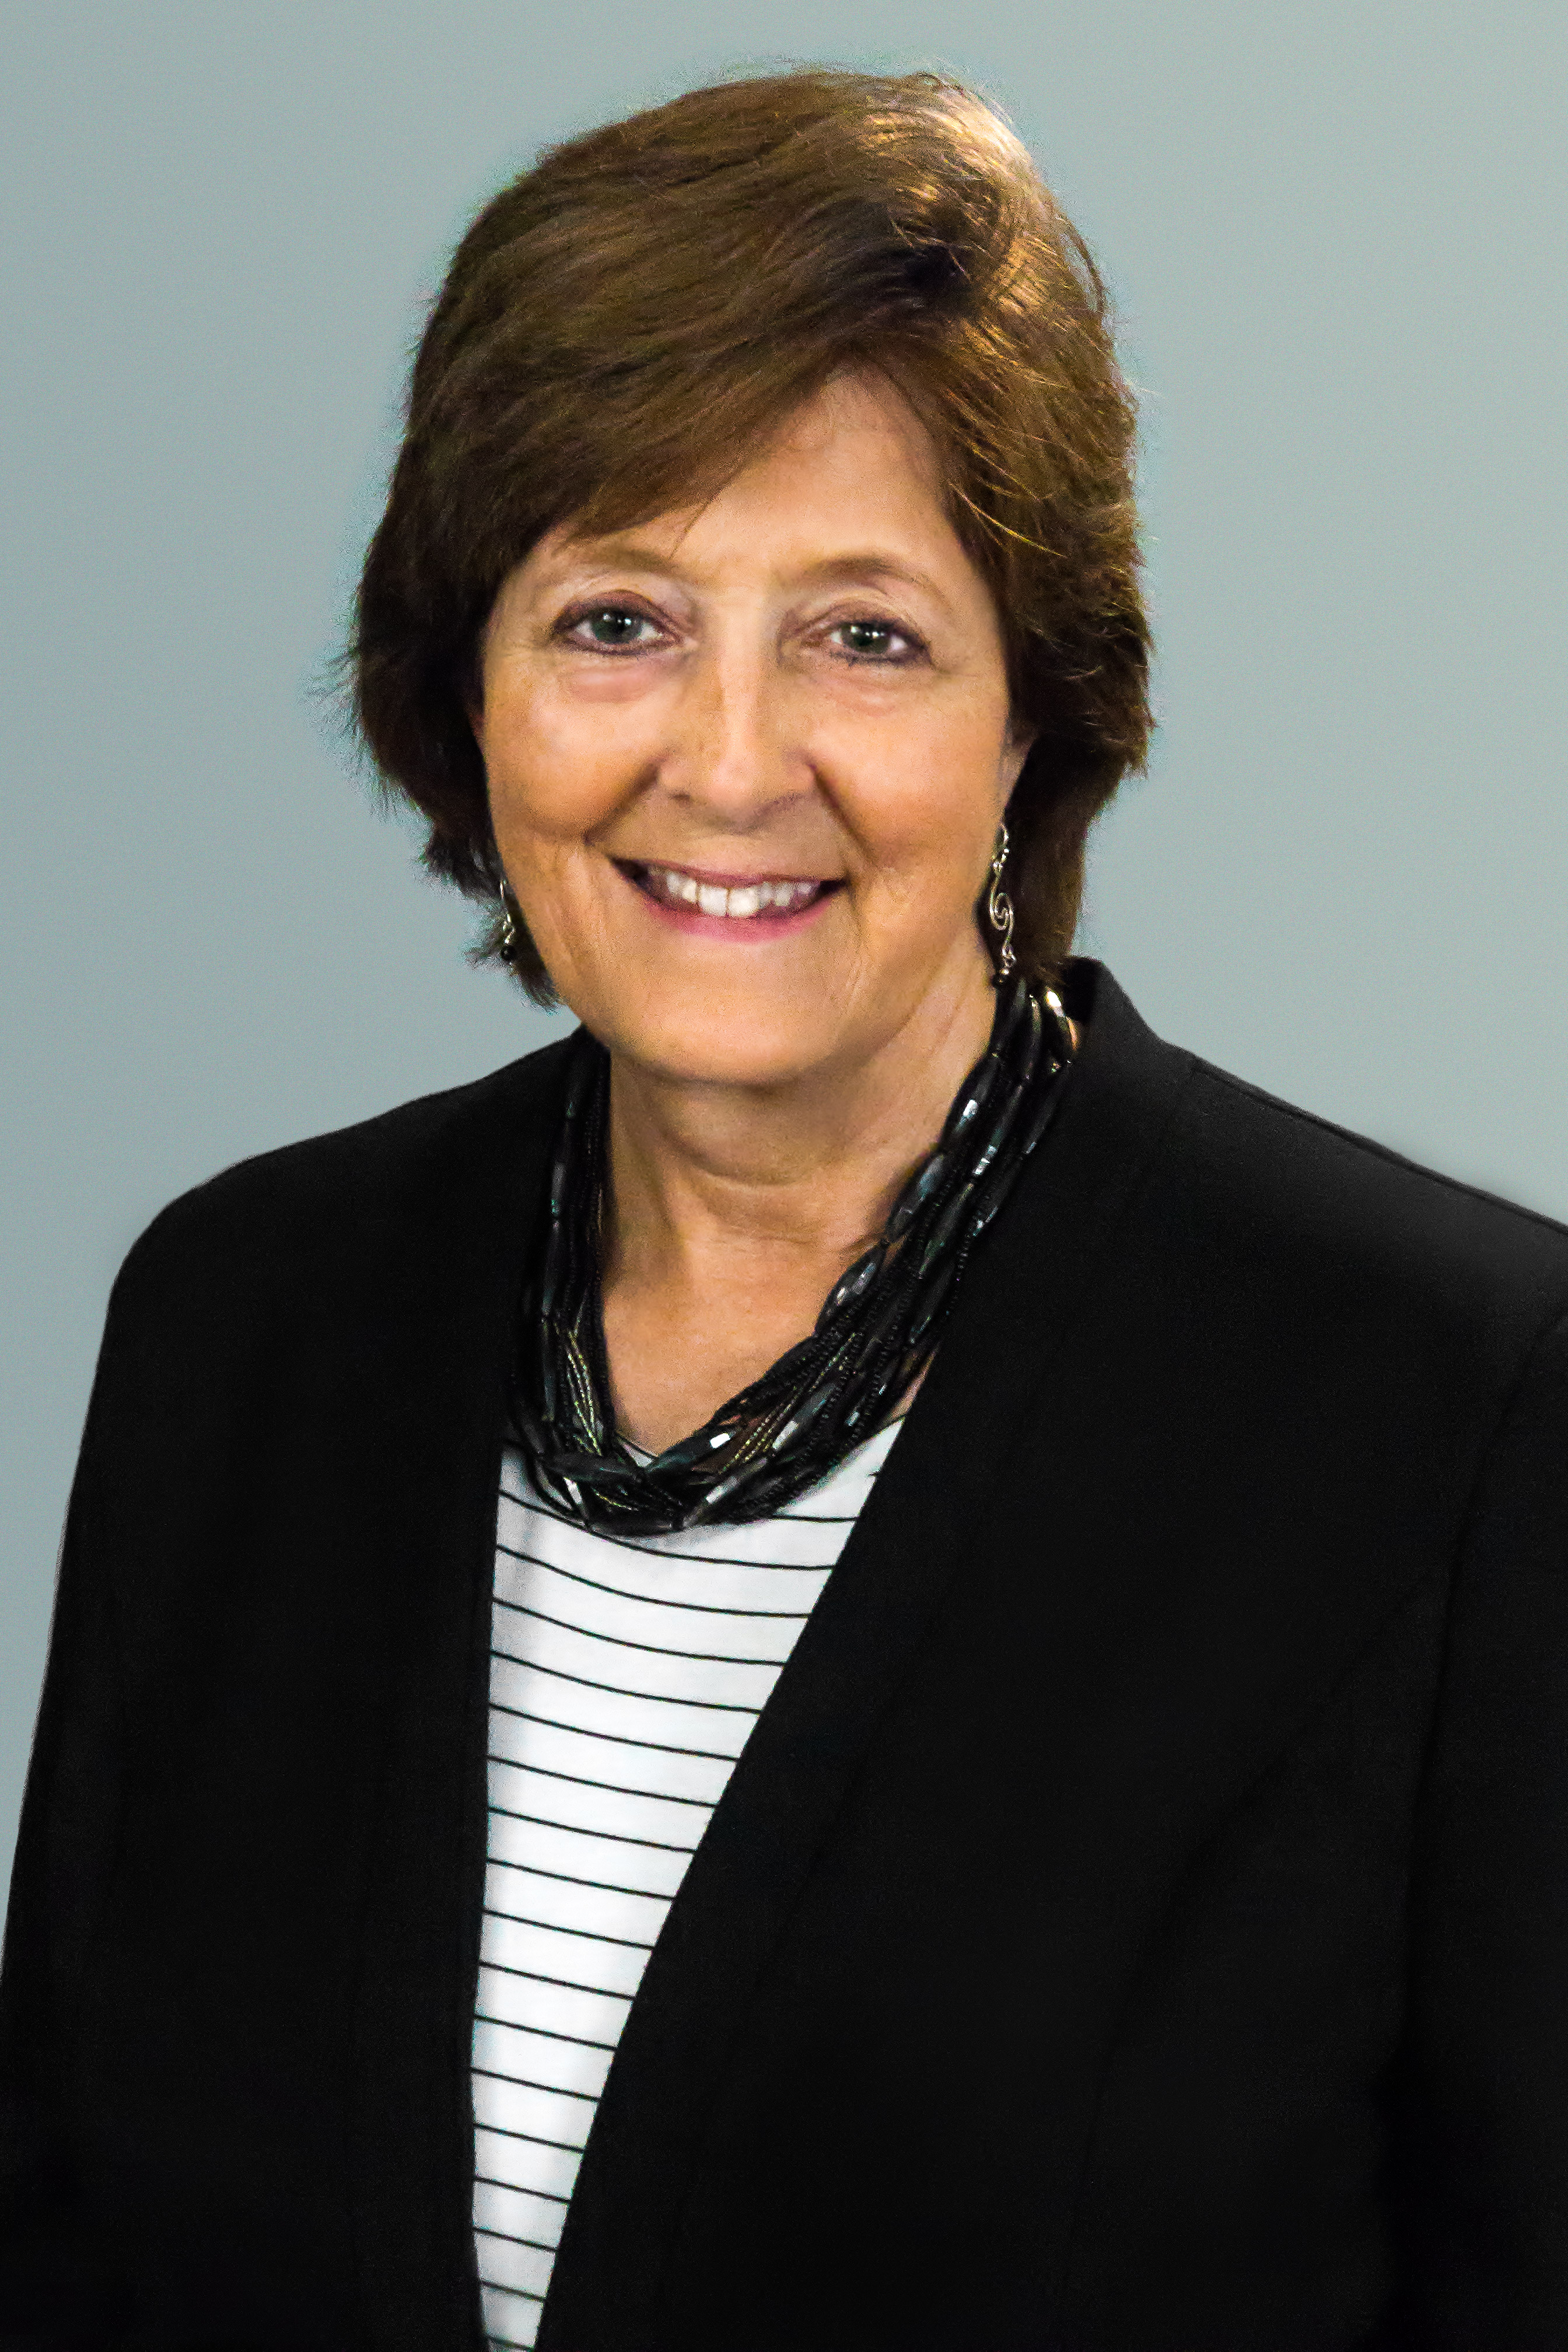 Judy Rich